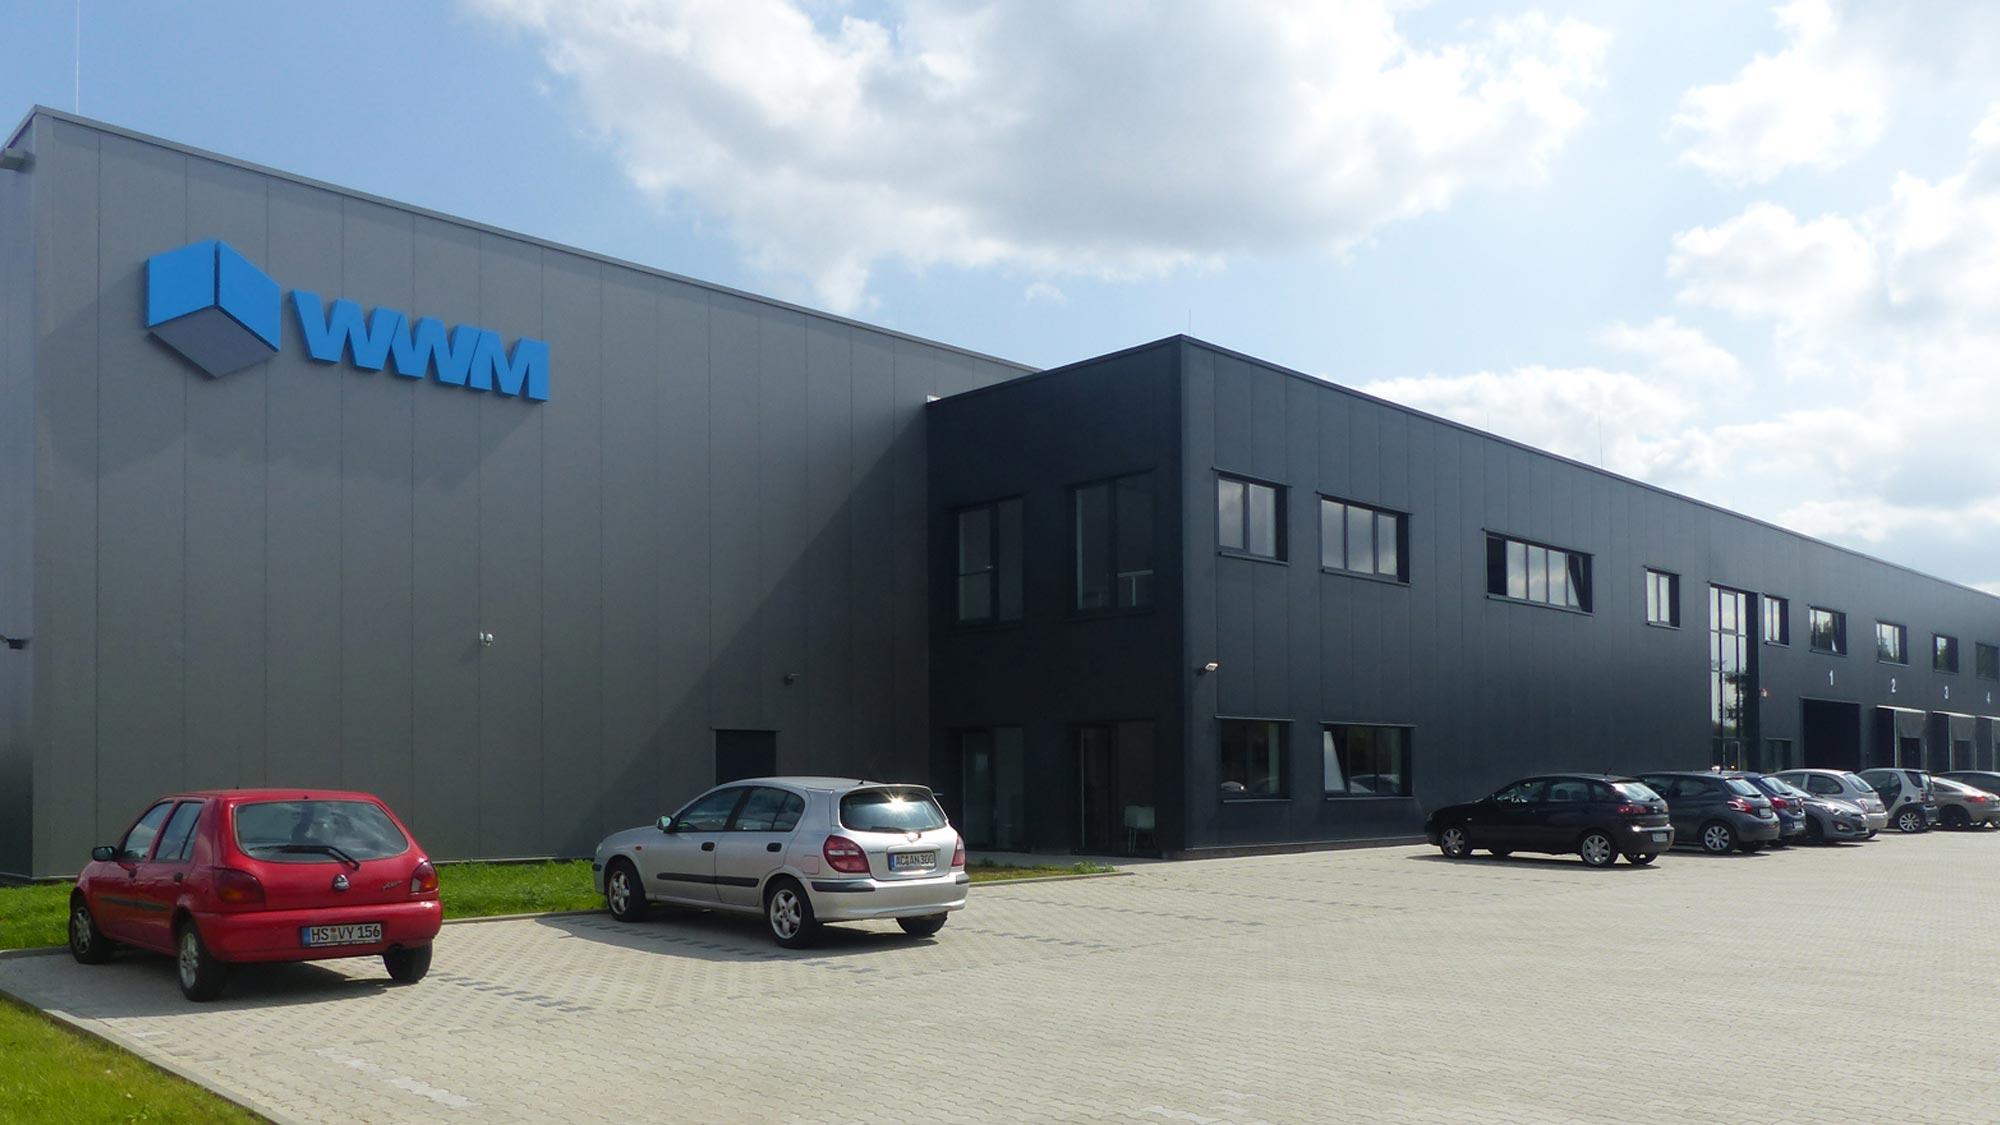 Hochmodernes Logistikcenter der WWM GmbH & Co. KG